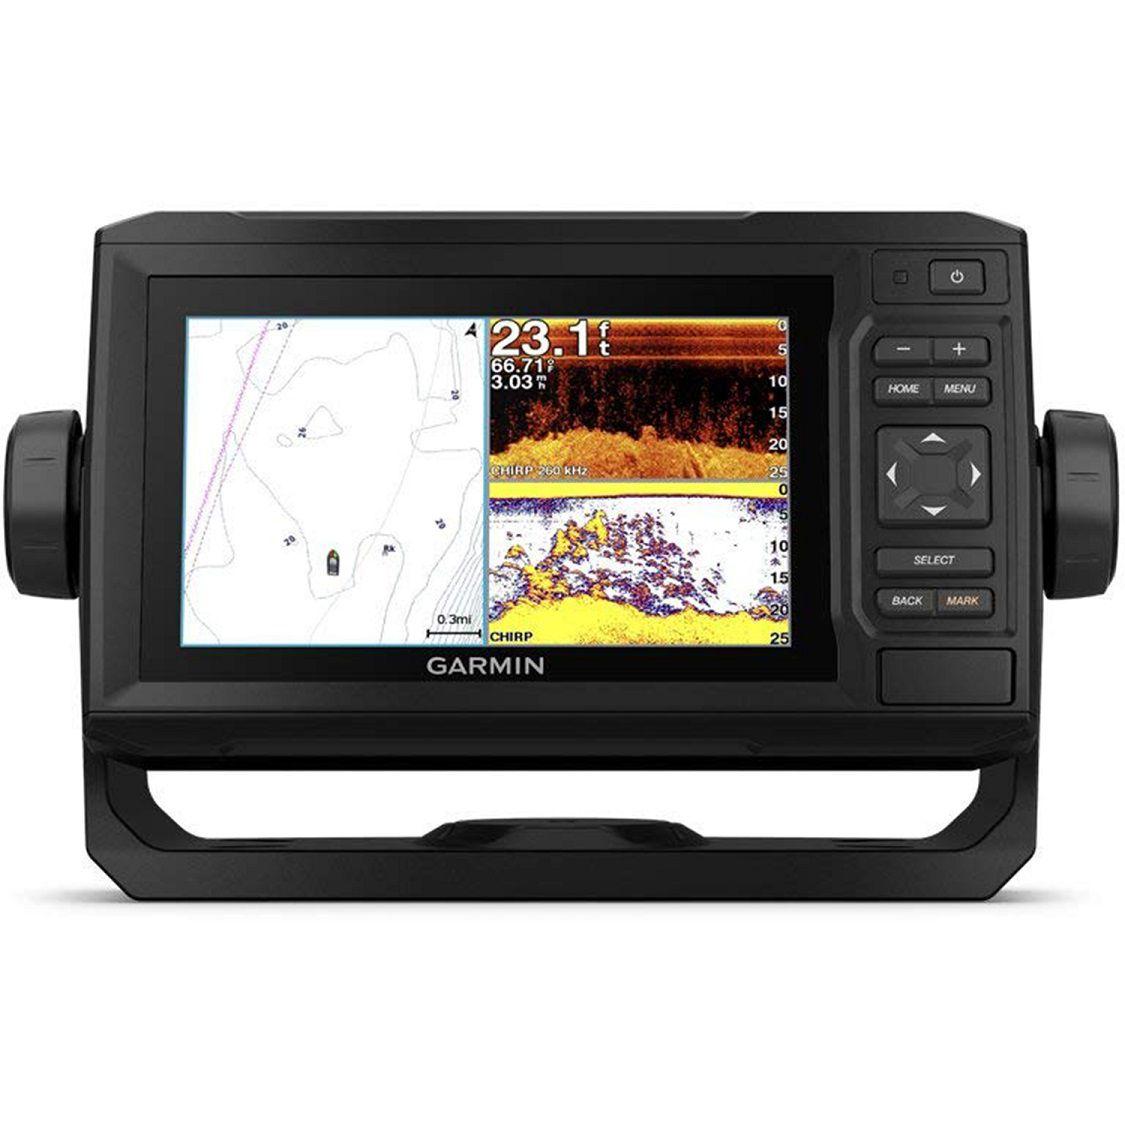 Gps Sonar Garmin Echomap Plus 64cv + Transdutor Gt20-tm 8 Pinos 010-01890-00